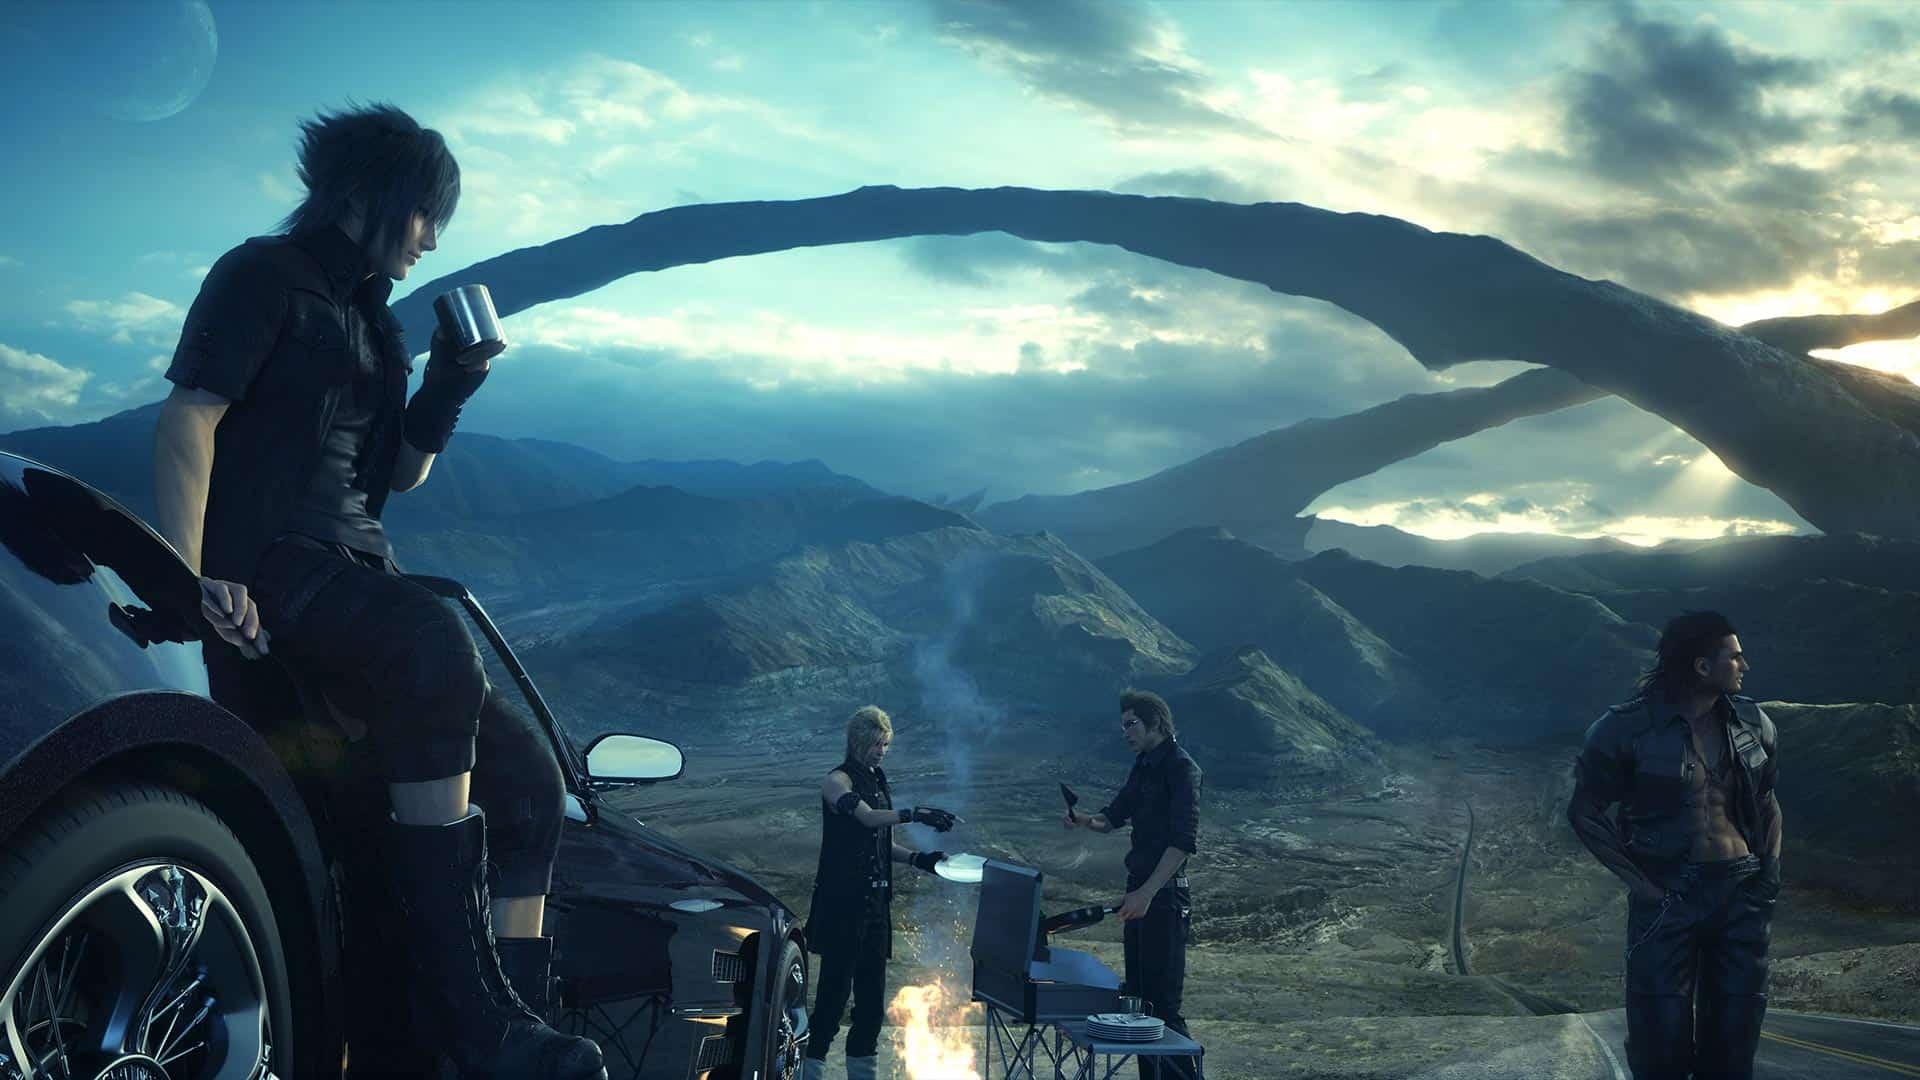 Final Fantasy XV camp - Come gira...Final Fantasy XV?